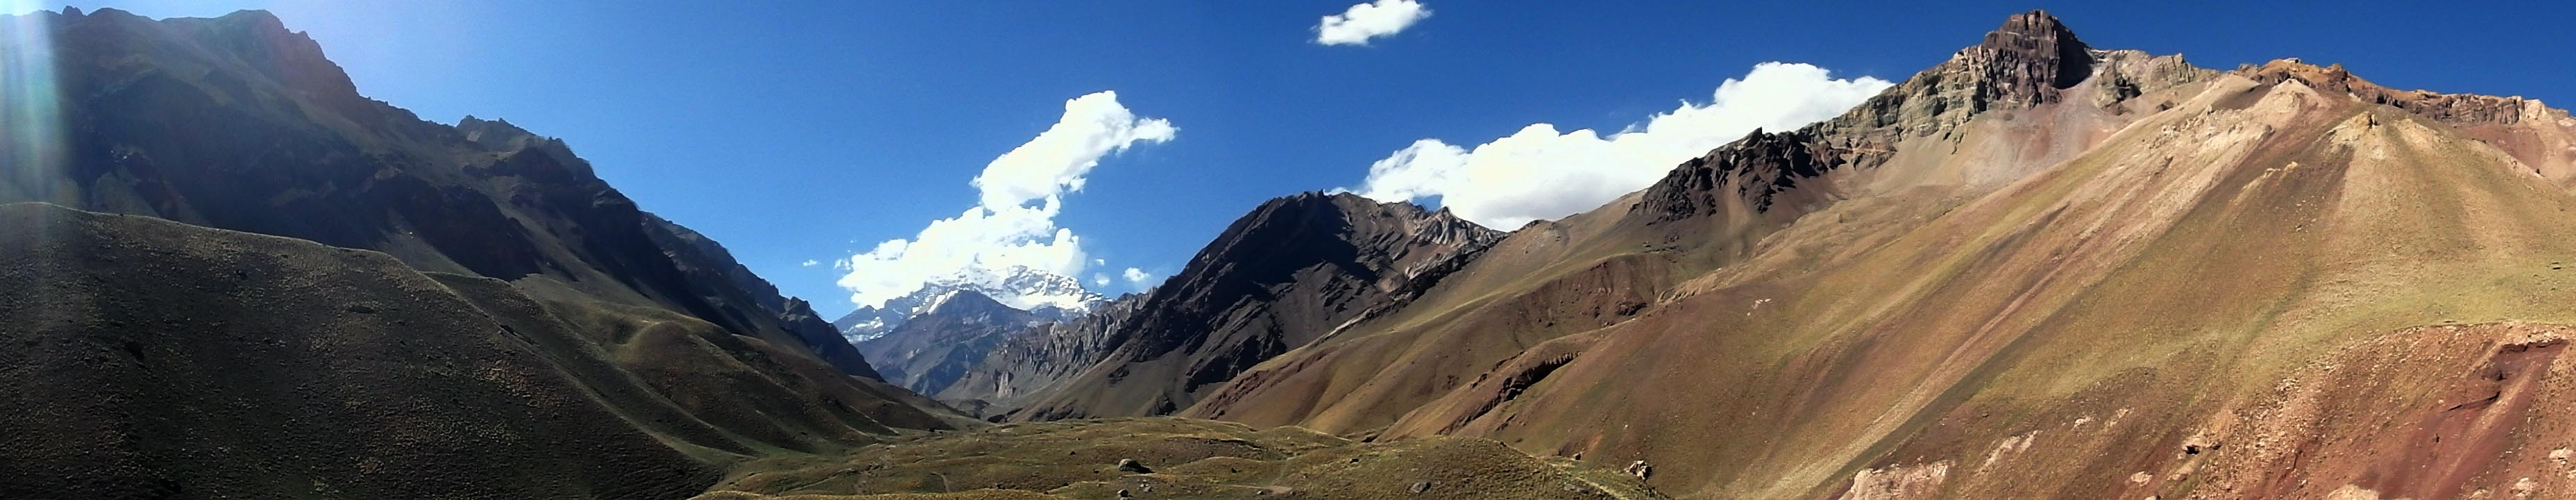 171218_Mendoza-Aconcagua103